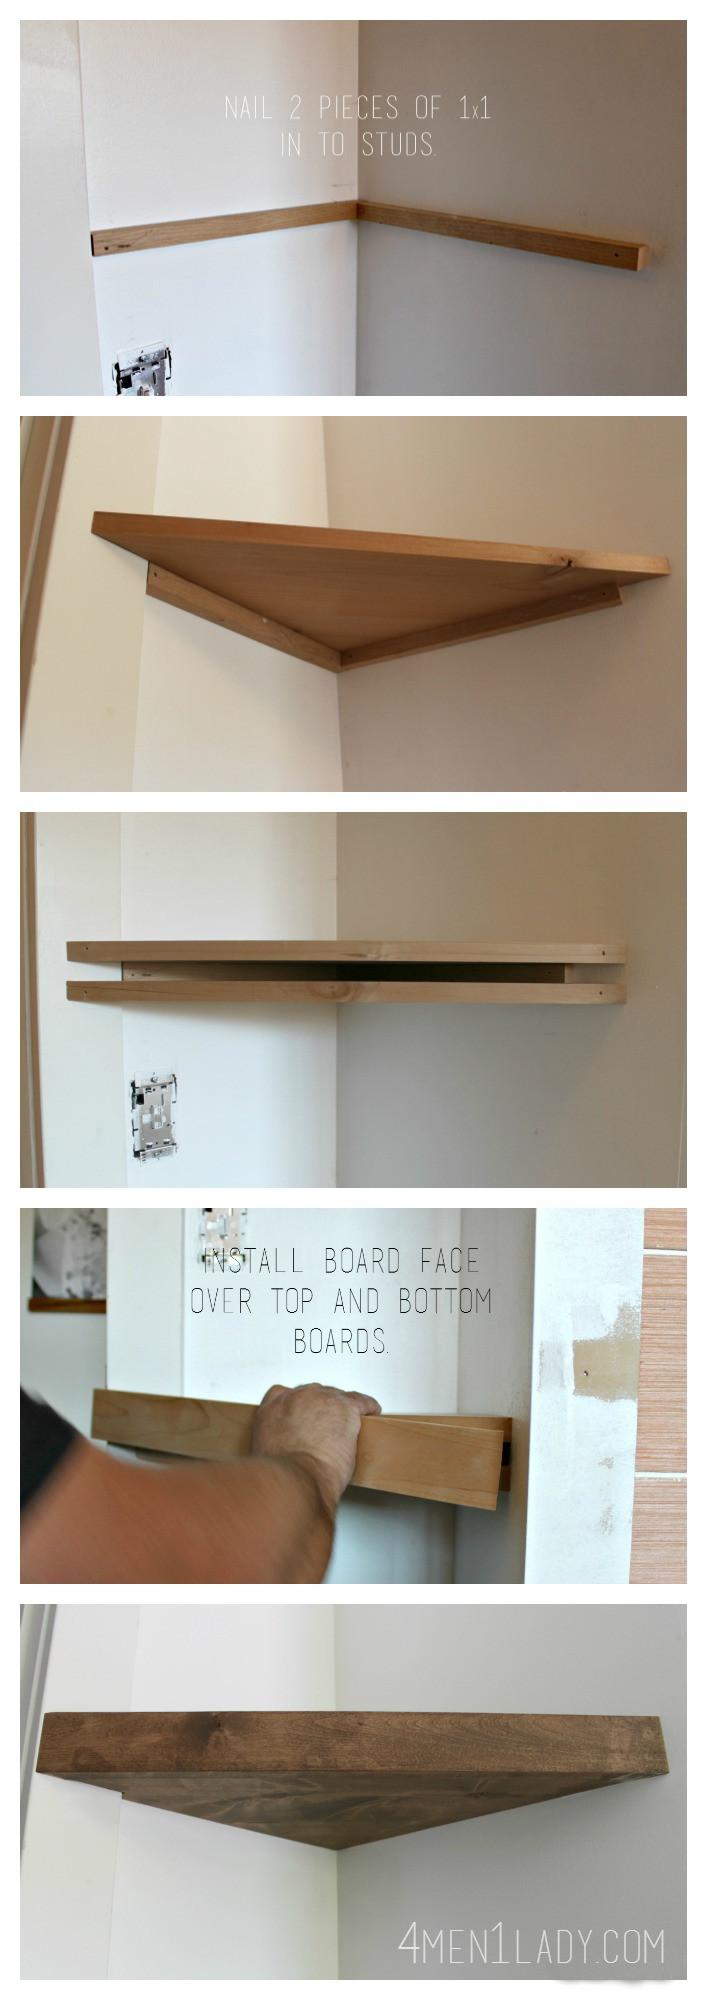 Best ideas about DIY Floating Corner Shelves . Save or Pin When Life Gives You Lemons…Make Corner Floating Shelves Now.